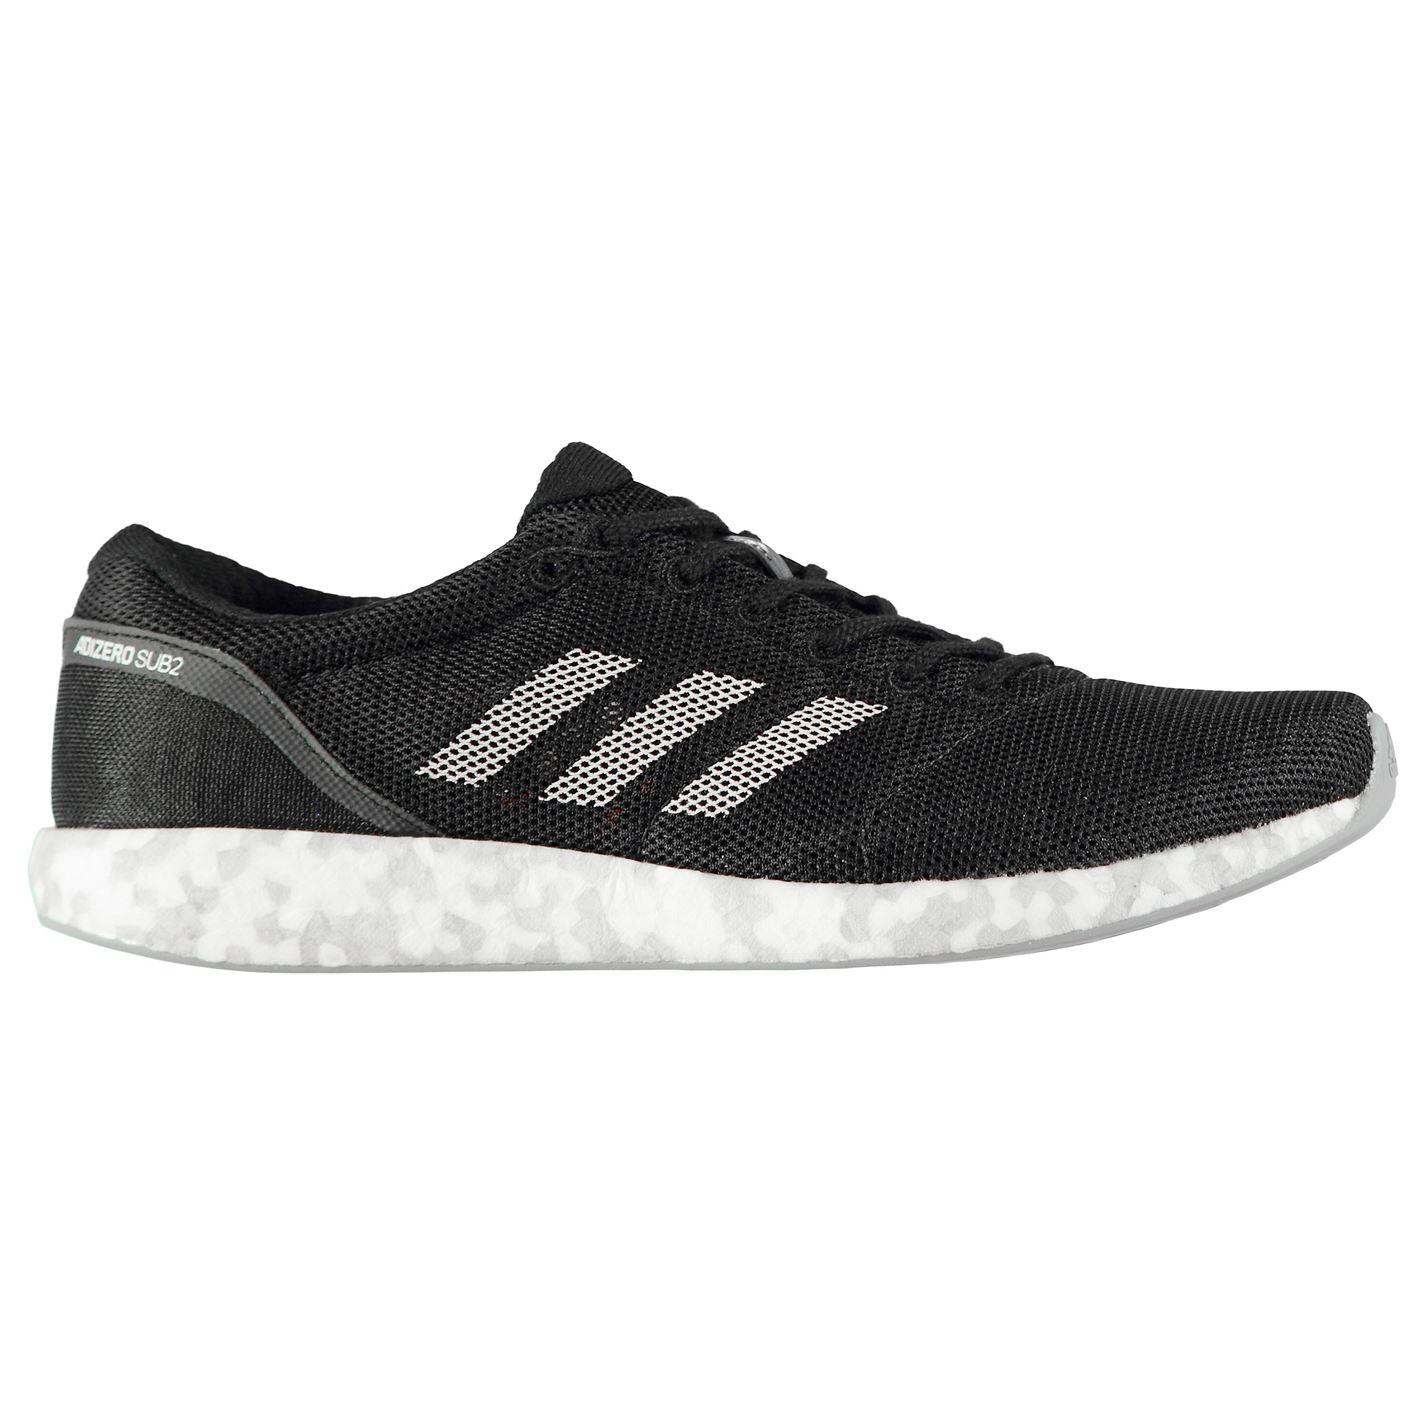 Adidas Adizero SUB2 Mens Running Shoes